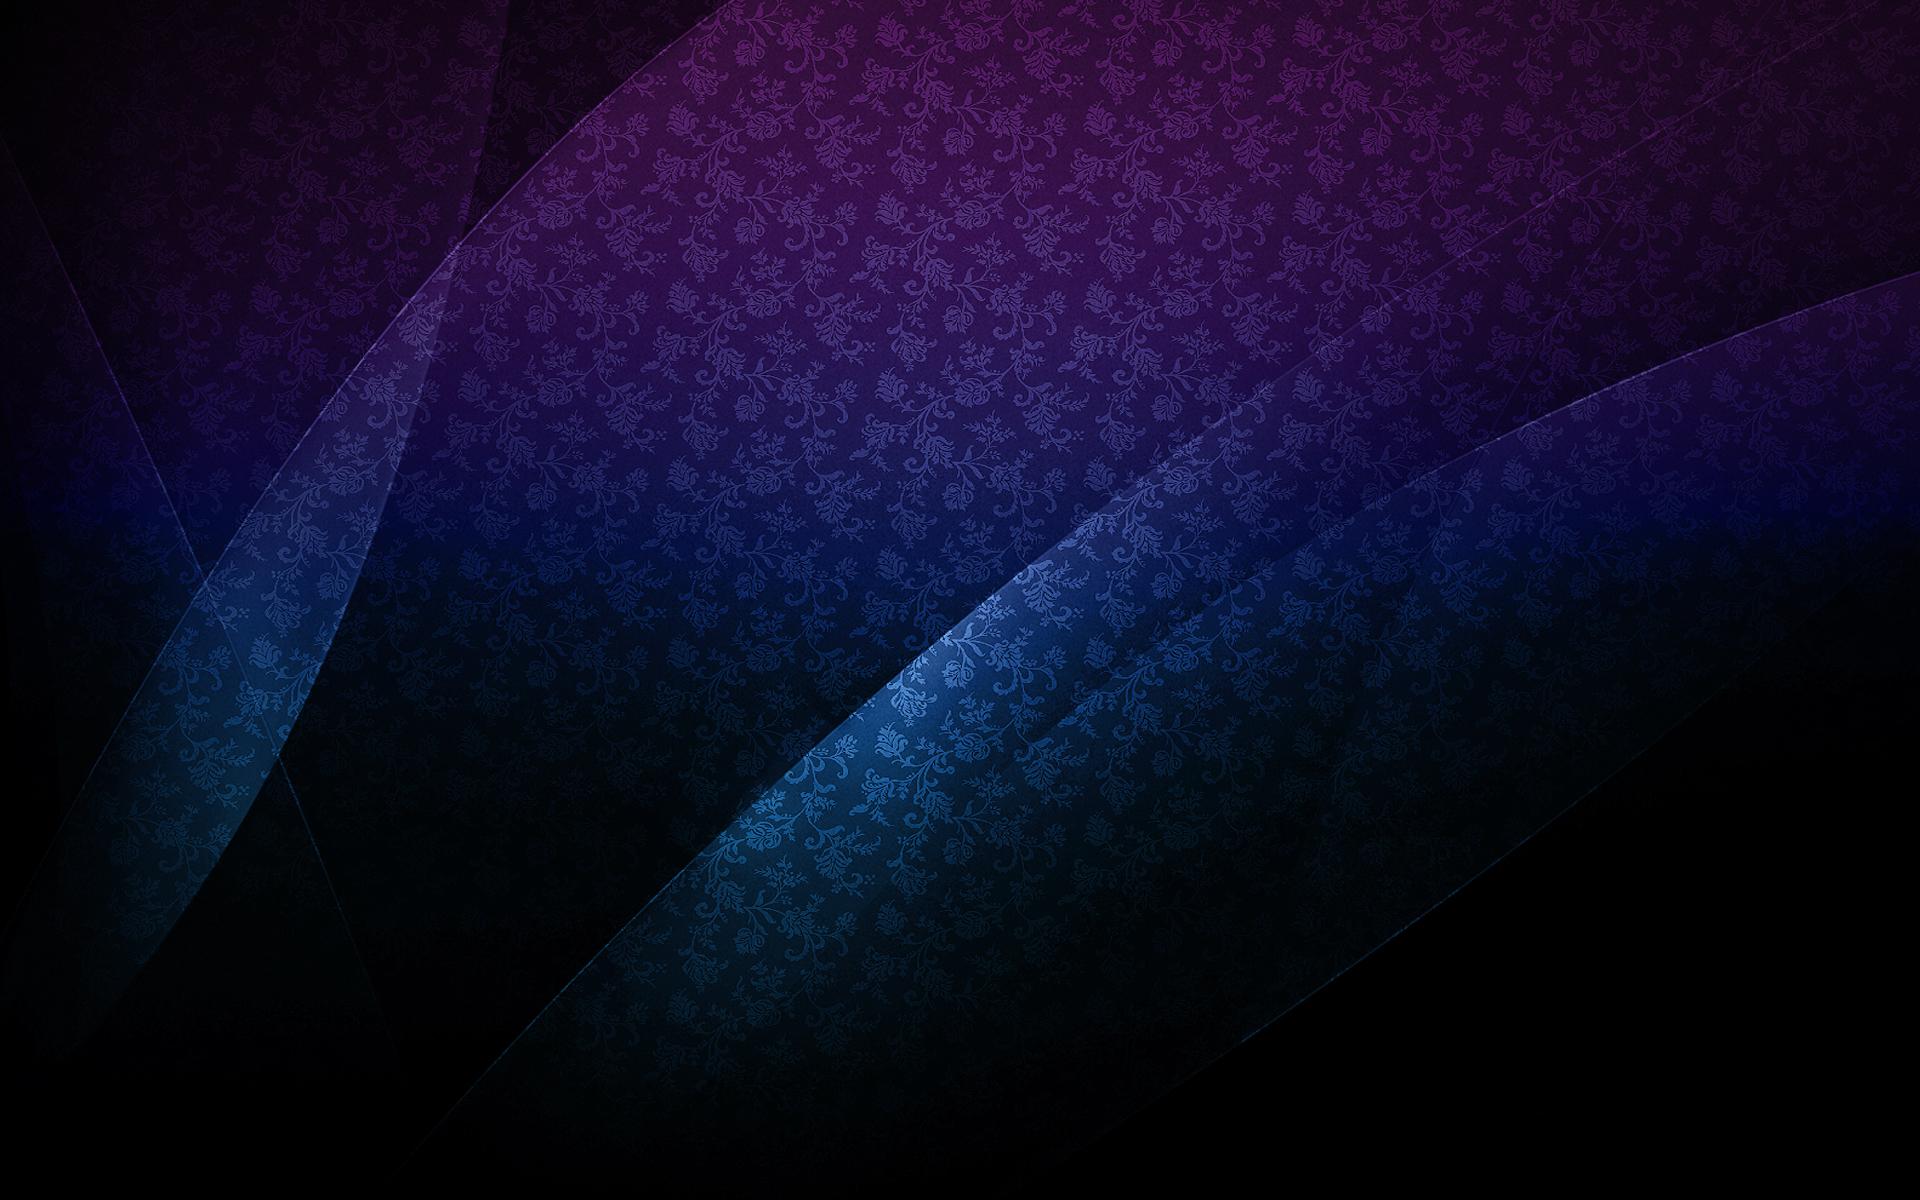 Purple Texture Blue Savers Screen wallpapers HD   169492 1920x1200